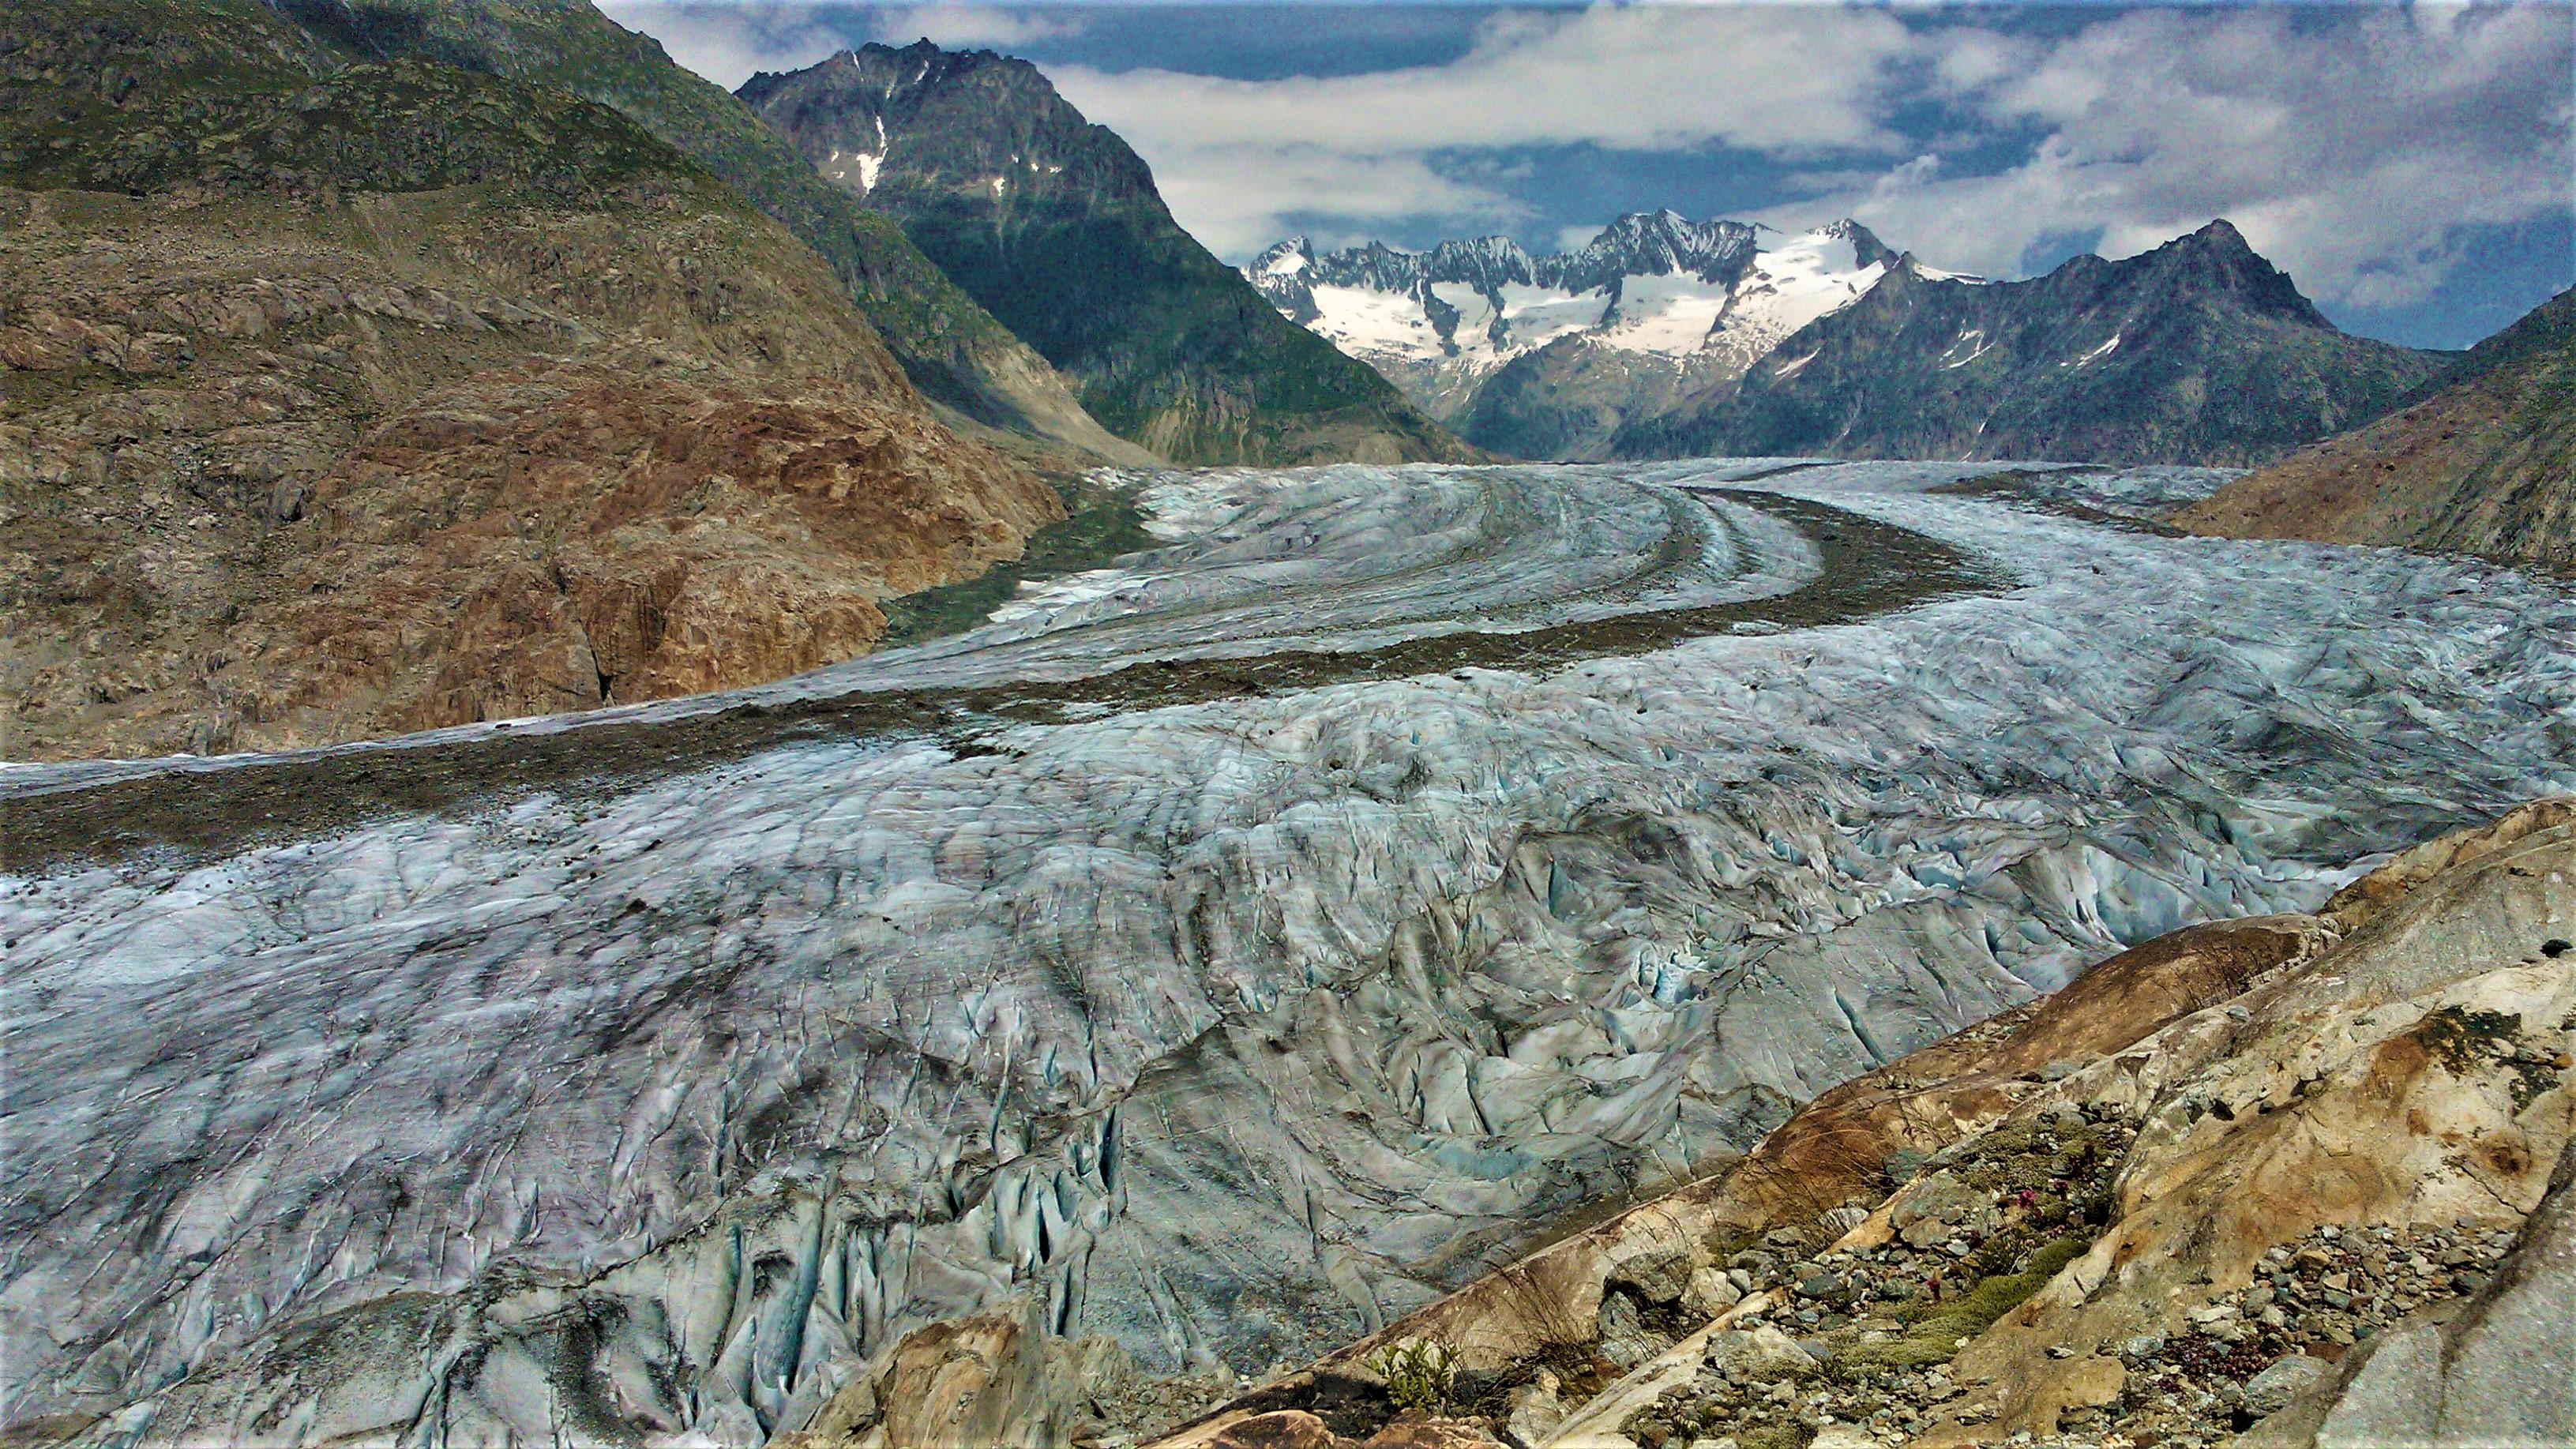 suisse voir glacier aletsch alpes blog voyage europe